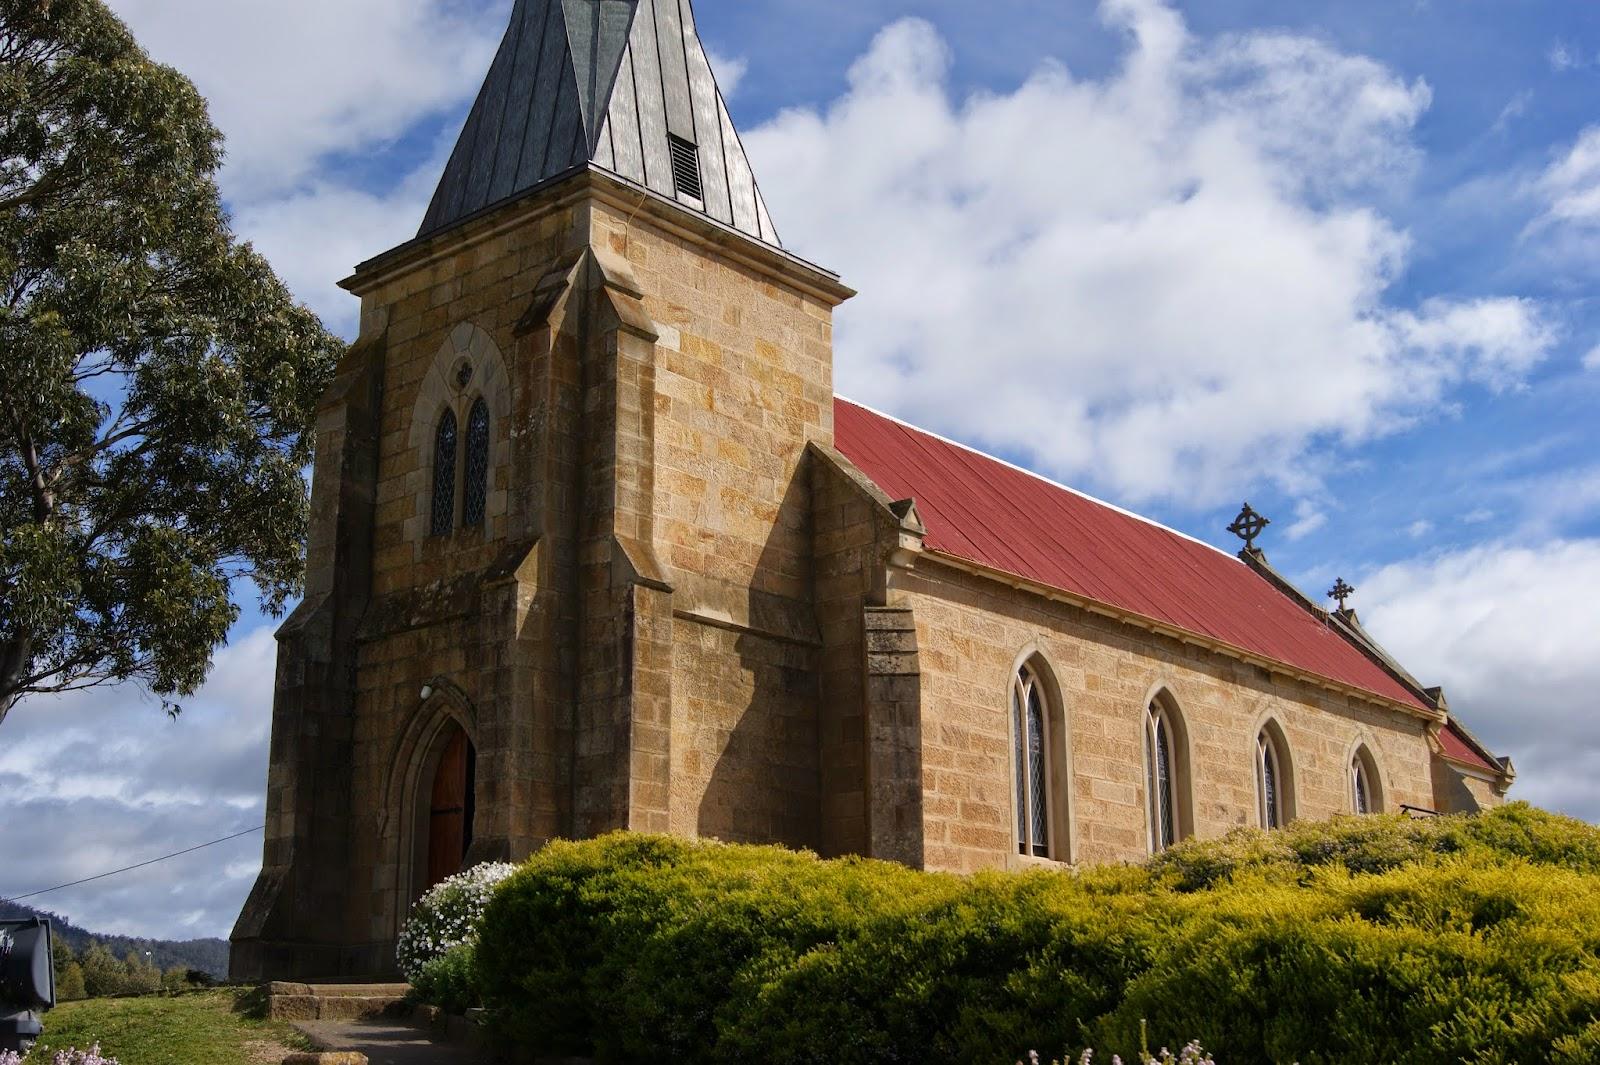 「St.John's Church richmond tas」的圖片搜尋結果